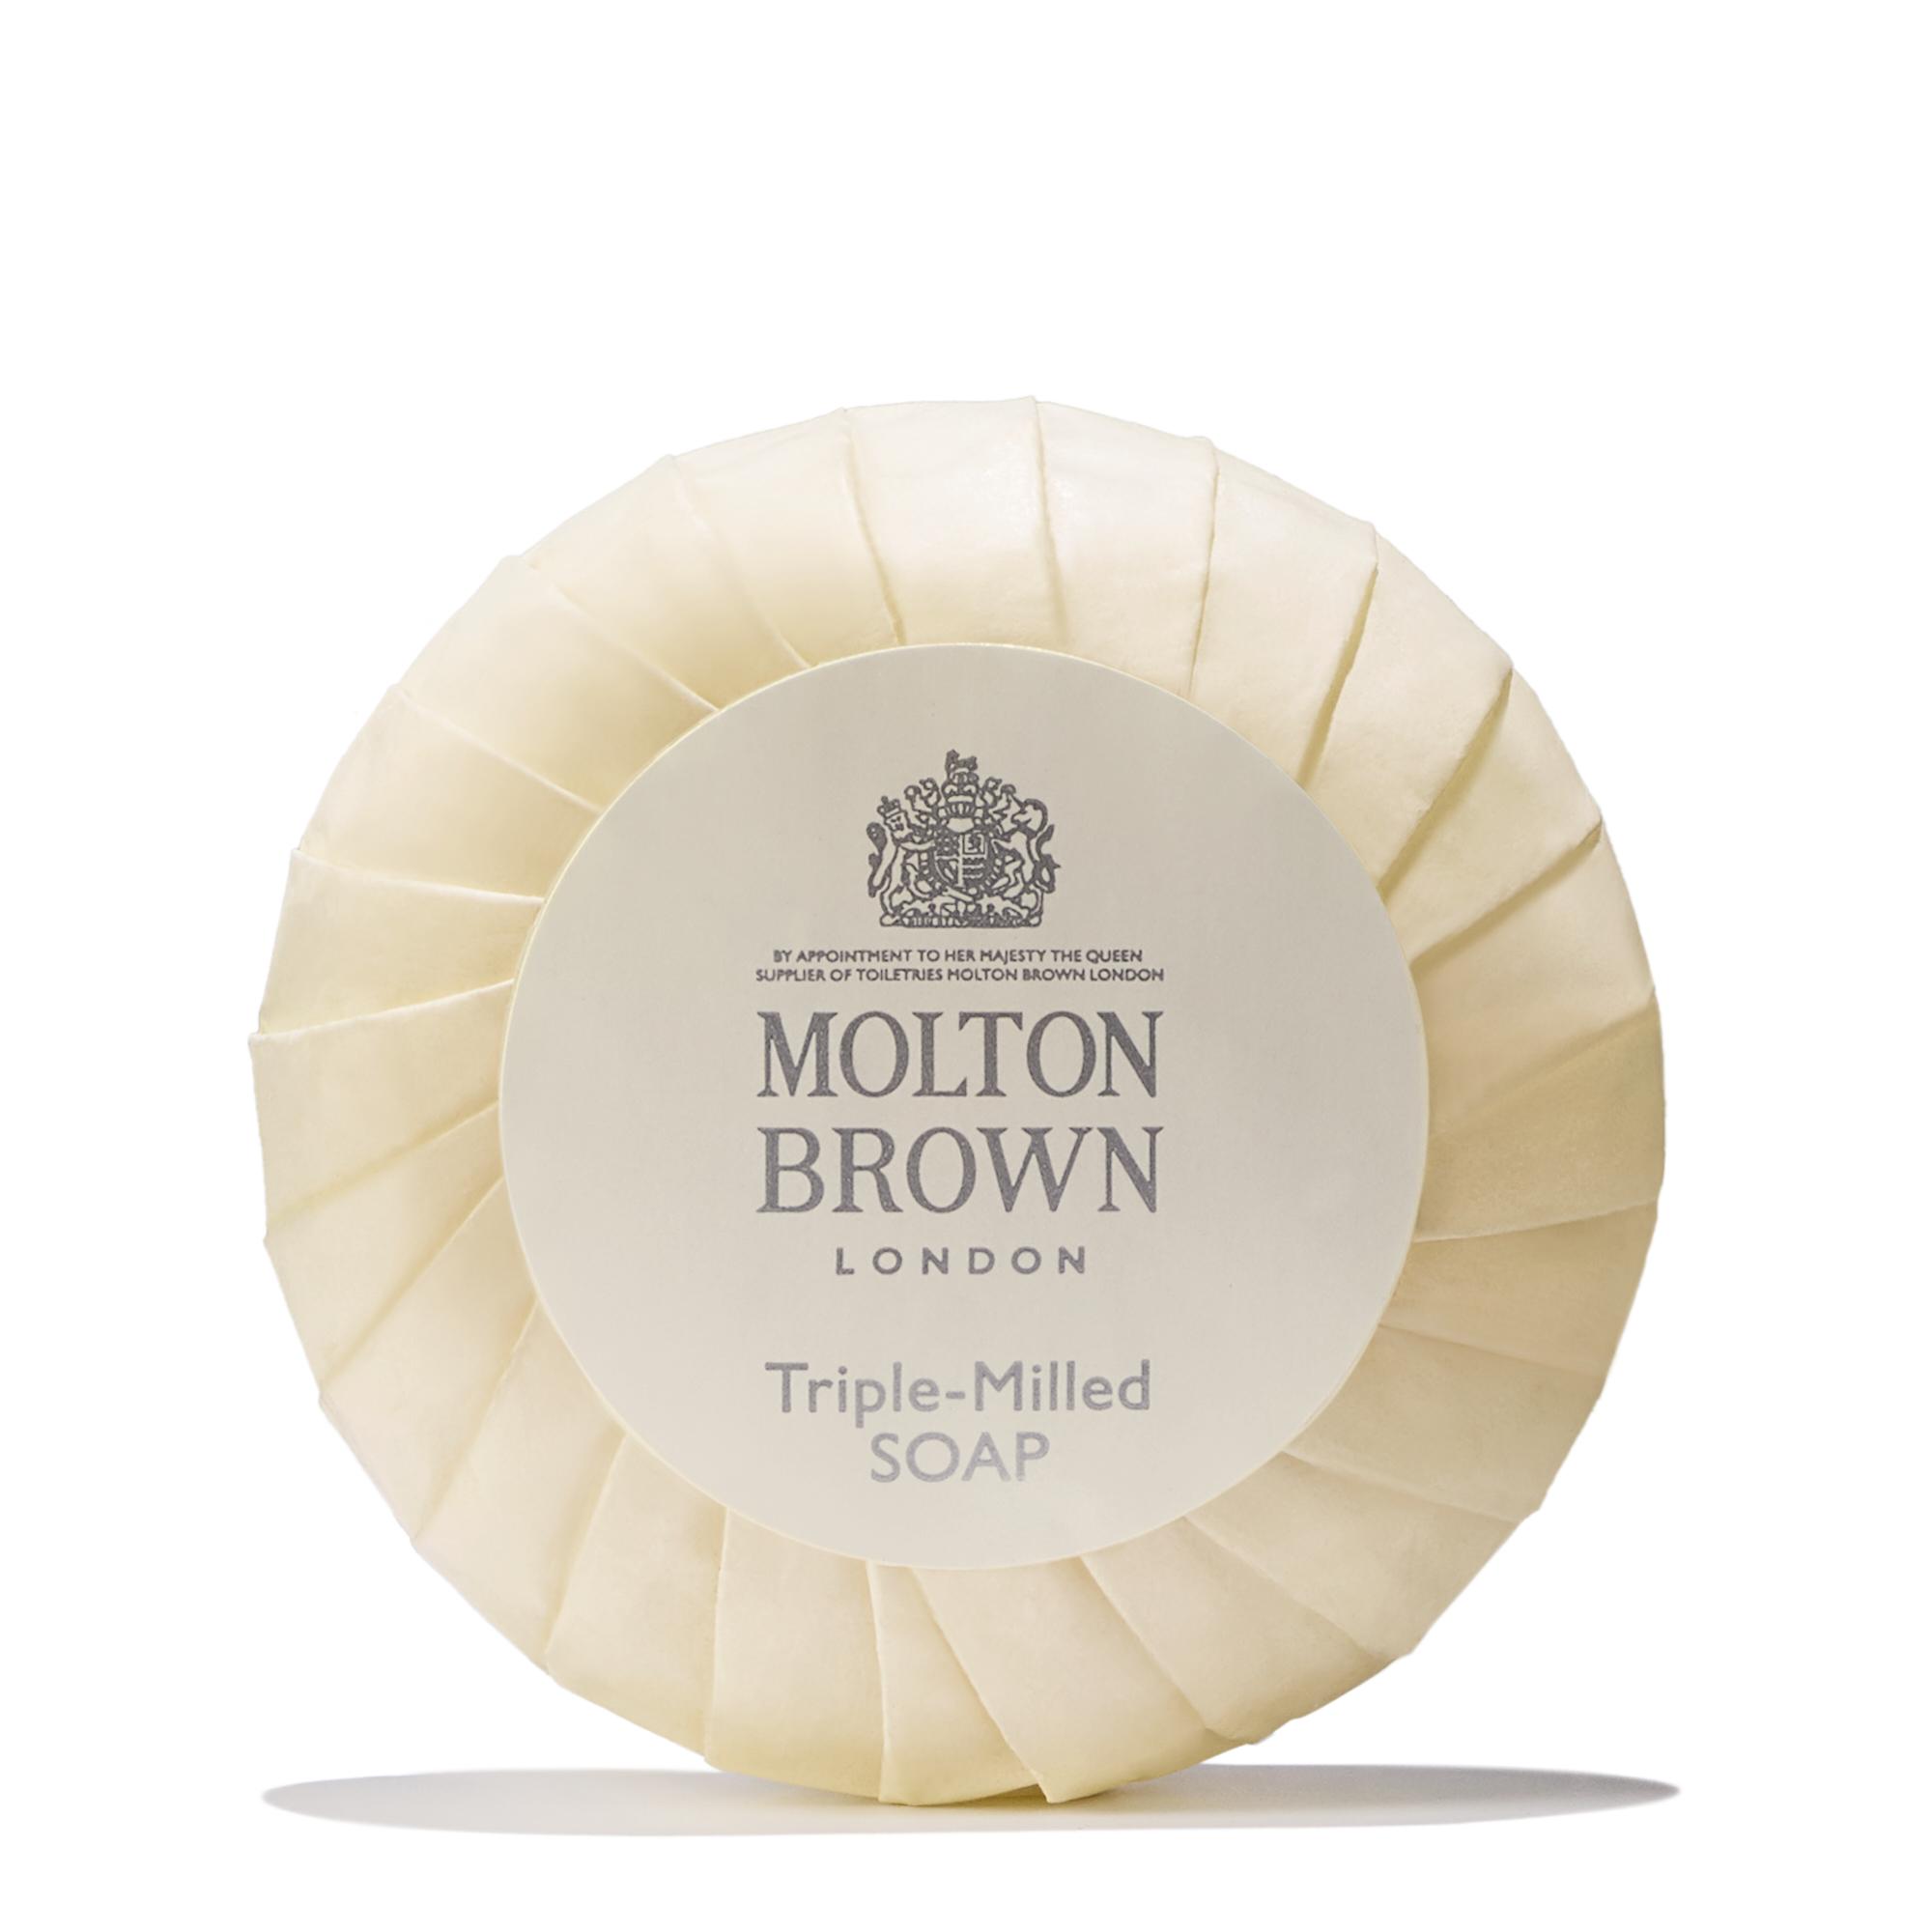 Molton Brown Ultra Pure Milk Wrapped Soap 25g